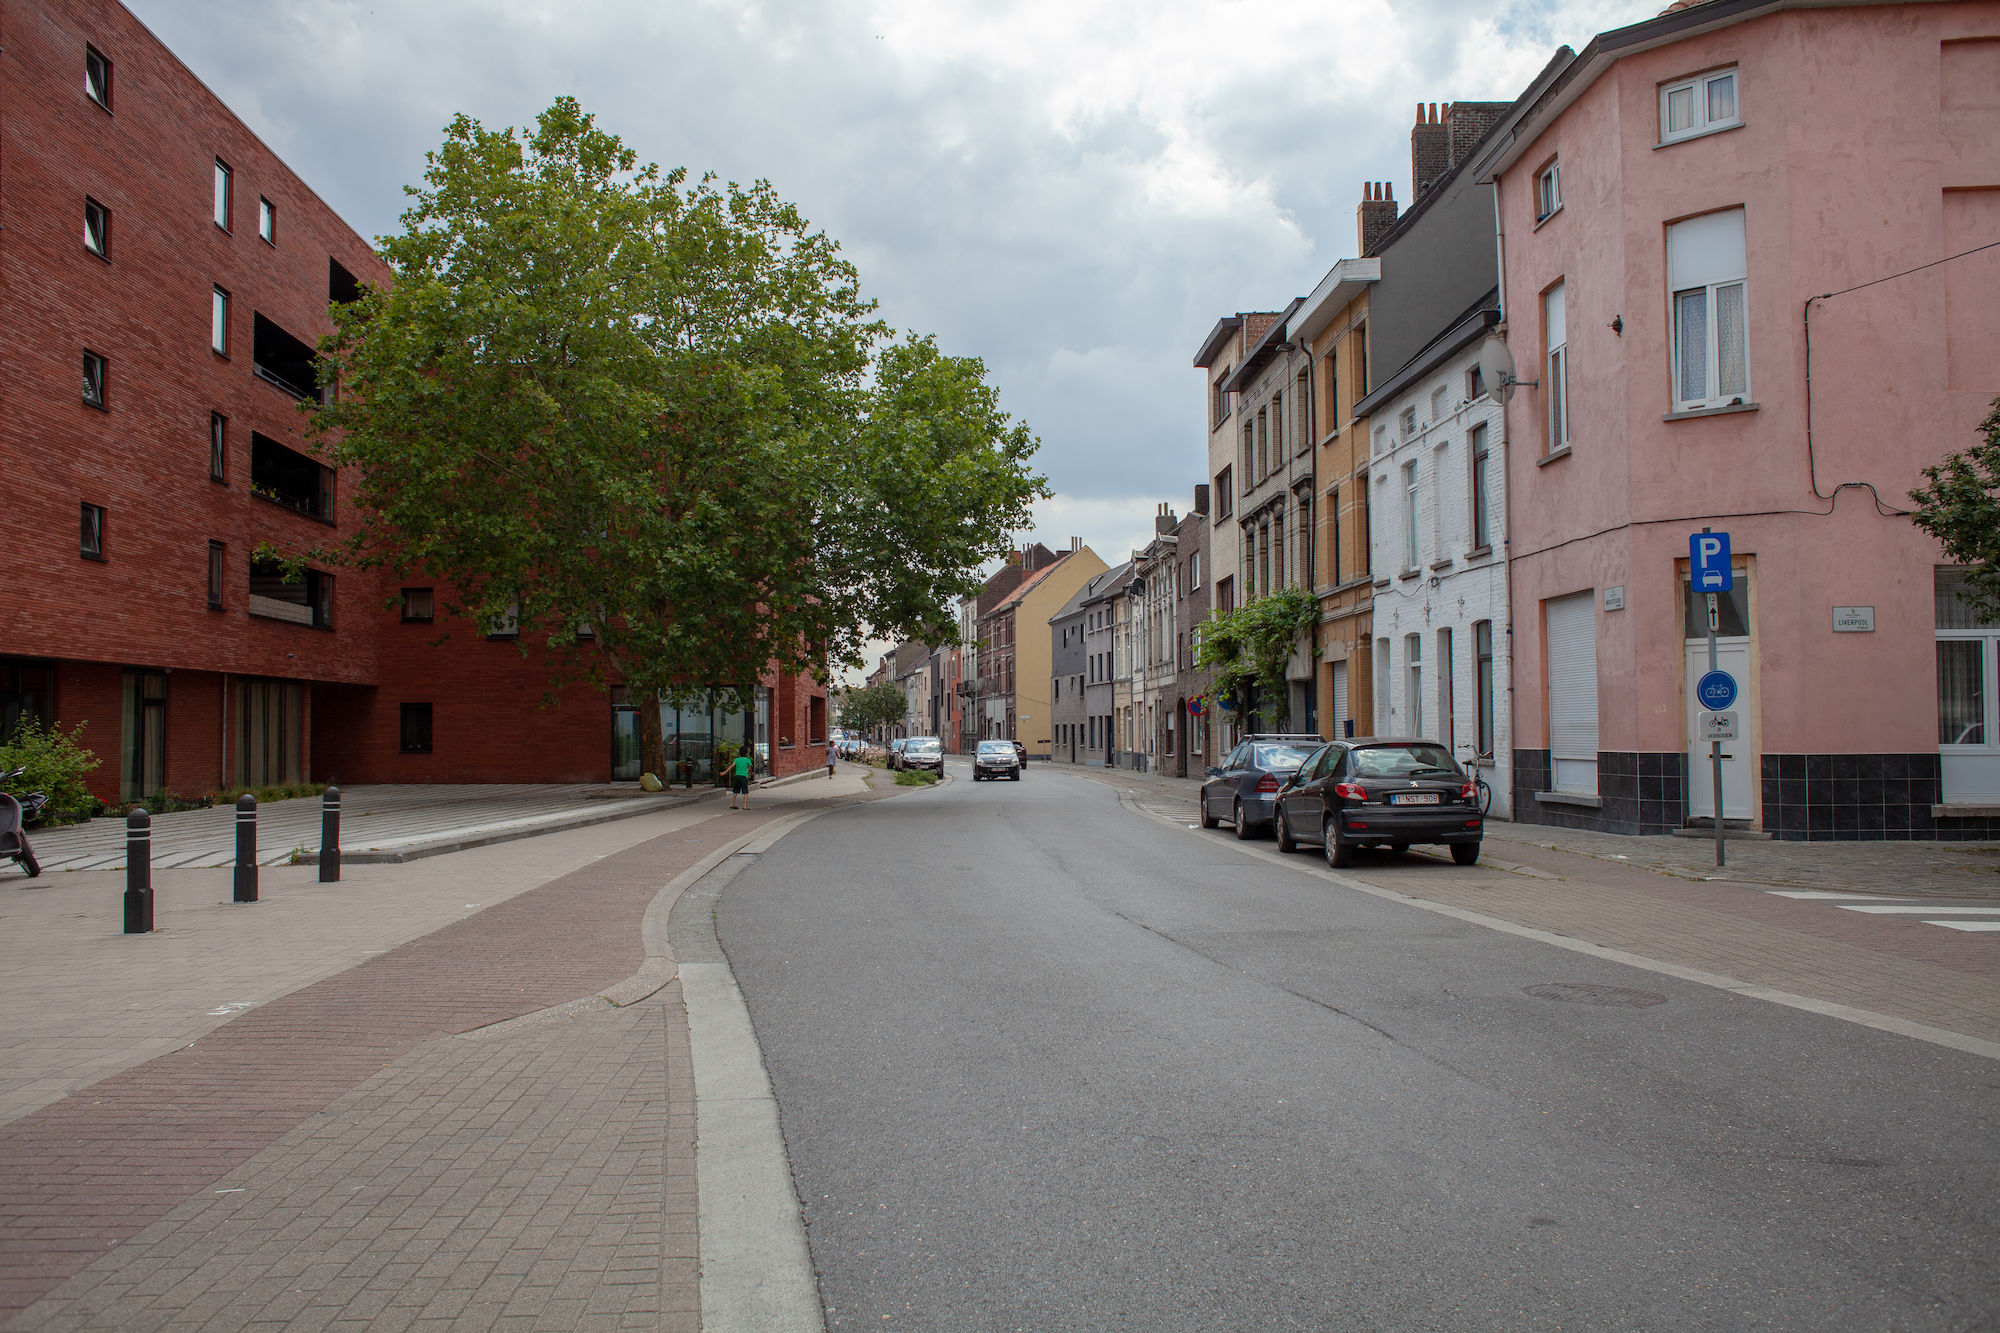 2019-07-02 Muide Meulestede prospectie Wannes_stadsvernieuwing_IMG_0305-2.jpg